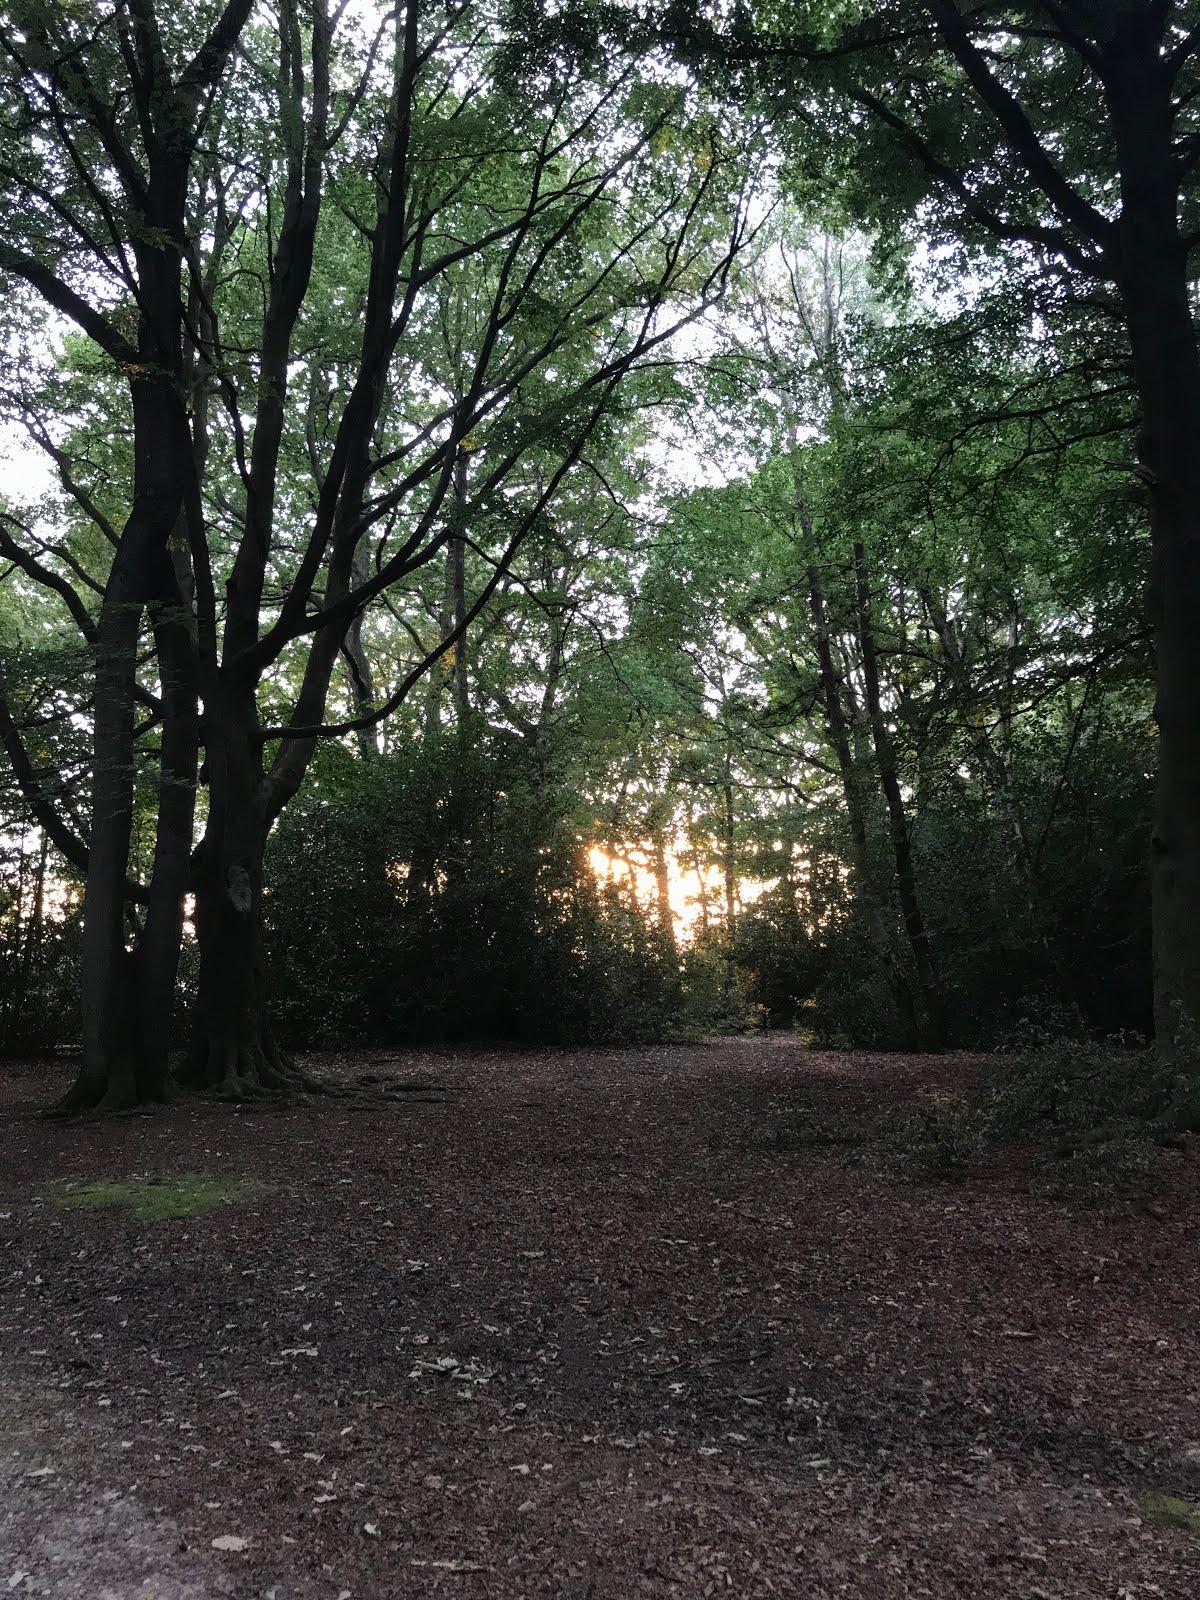 Sun shining through woods